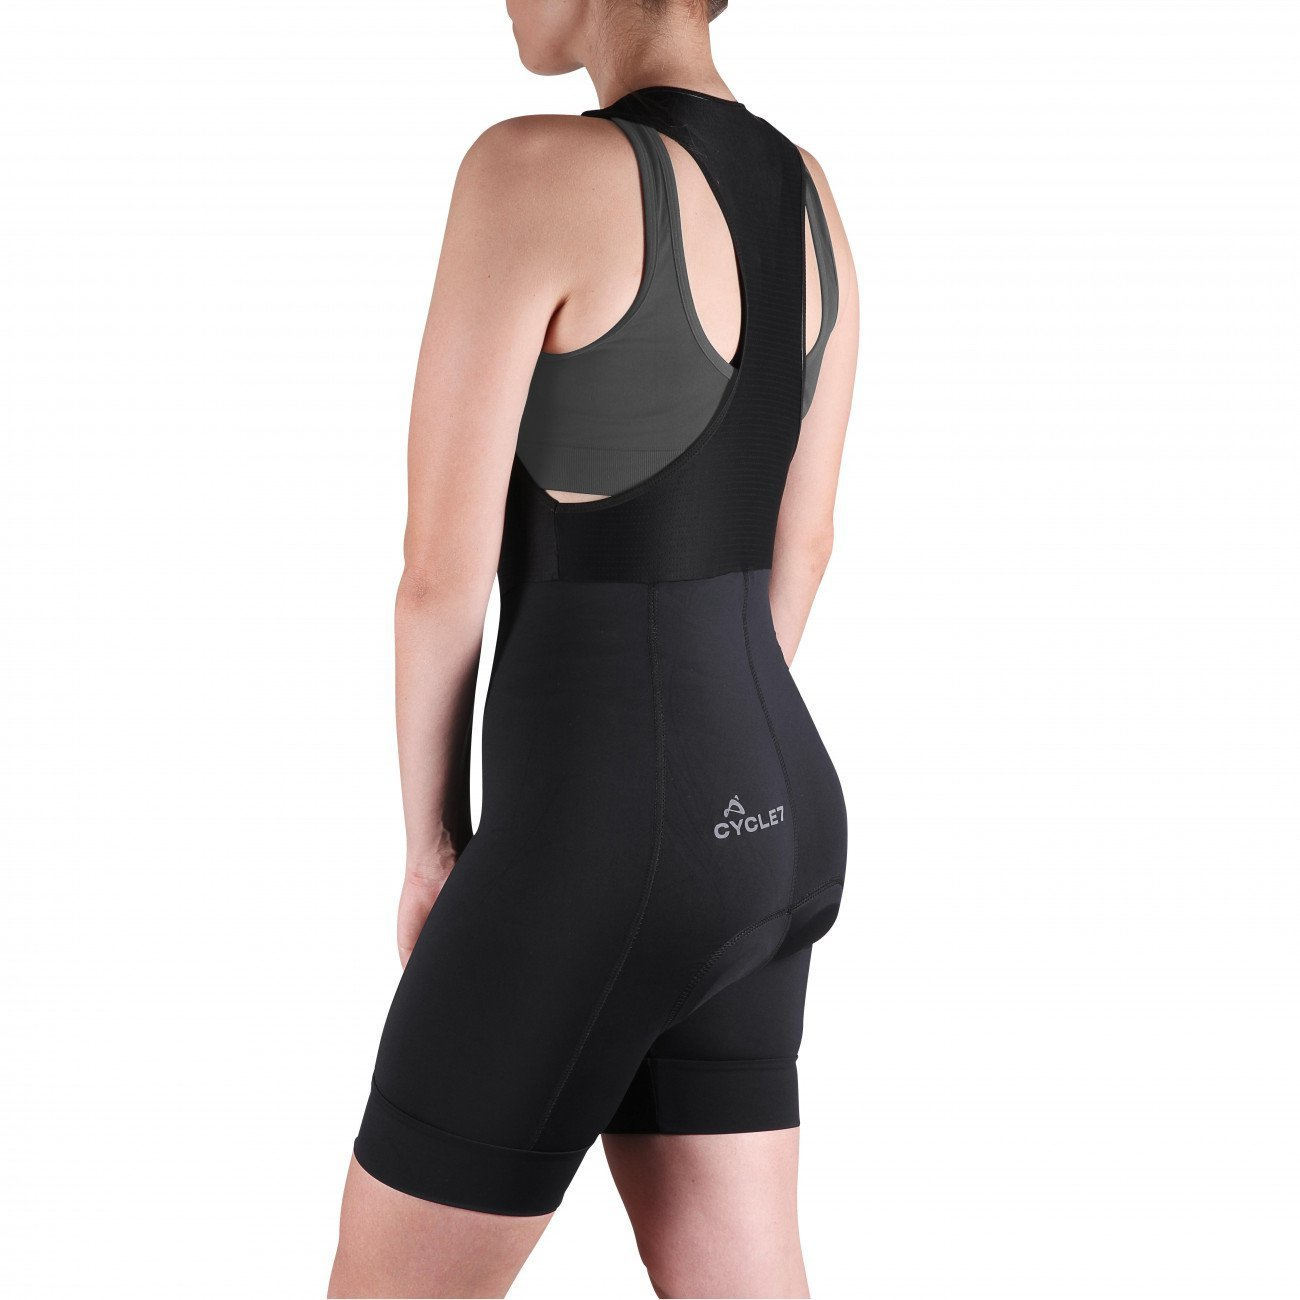 Bretelle Cycle7 Feminino Endurance Carbon com Forro MPro Gel